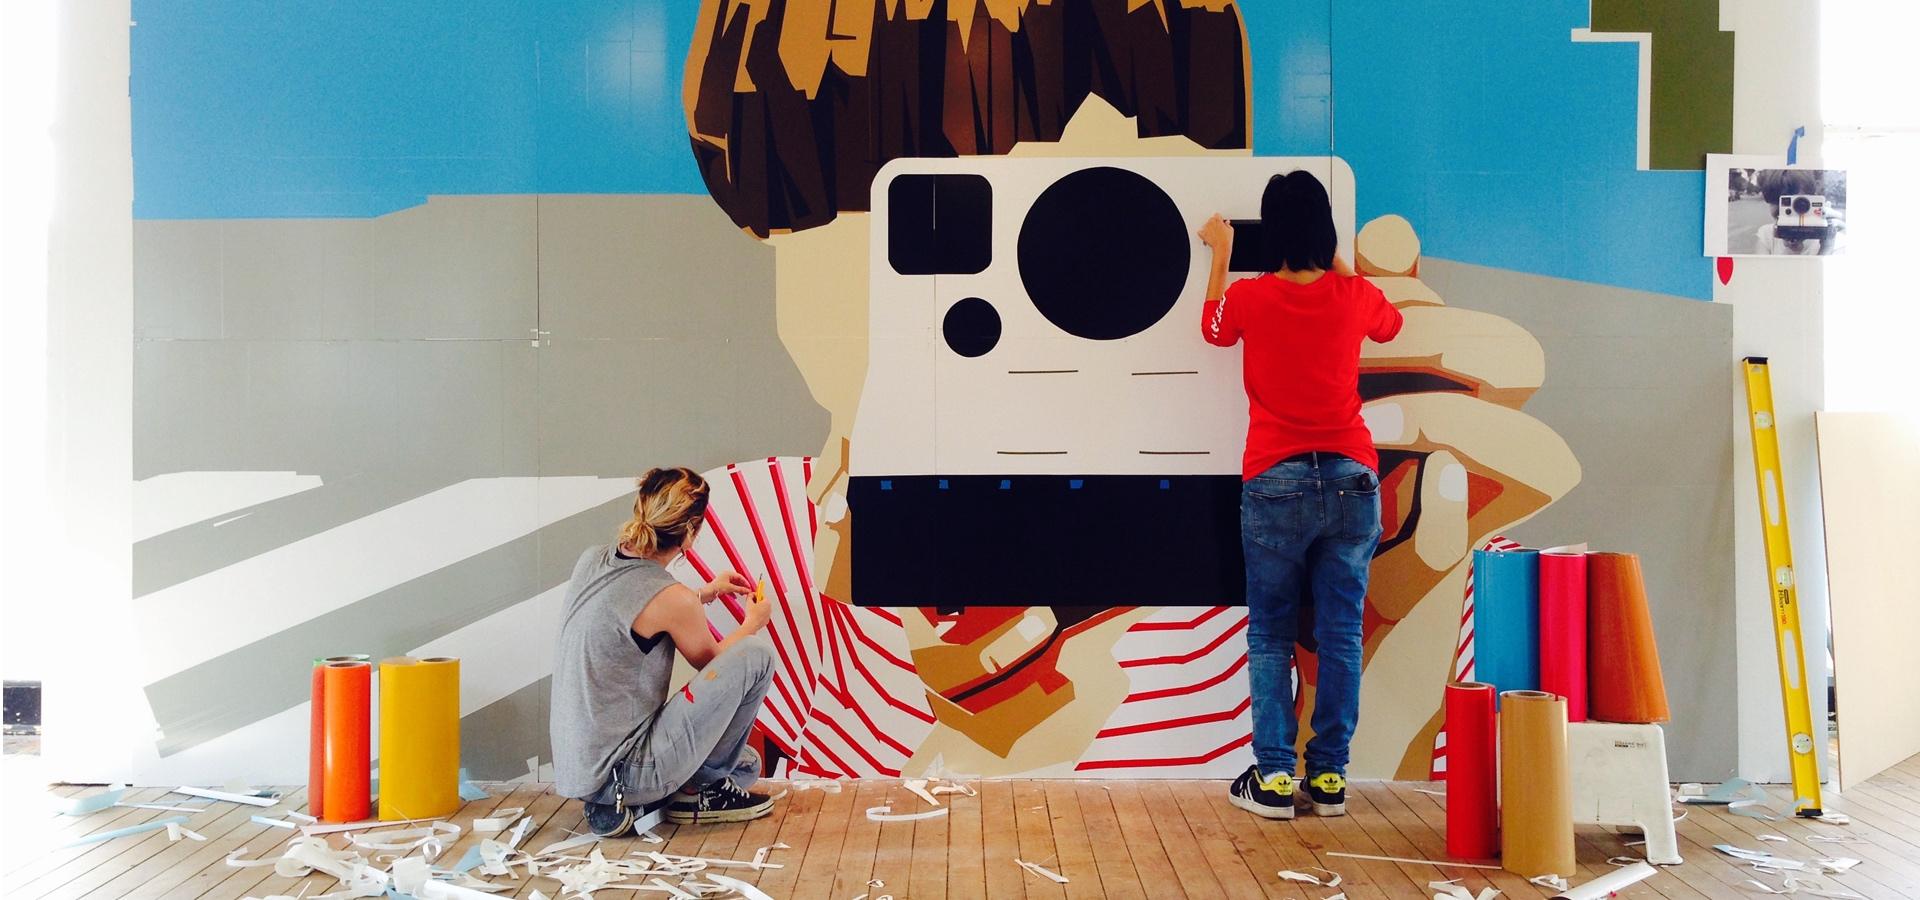 Artists installing cut vinyl wall